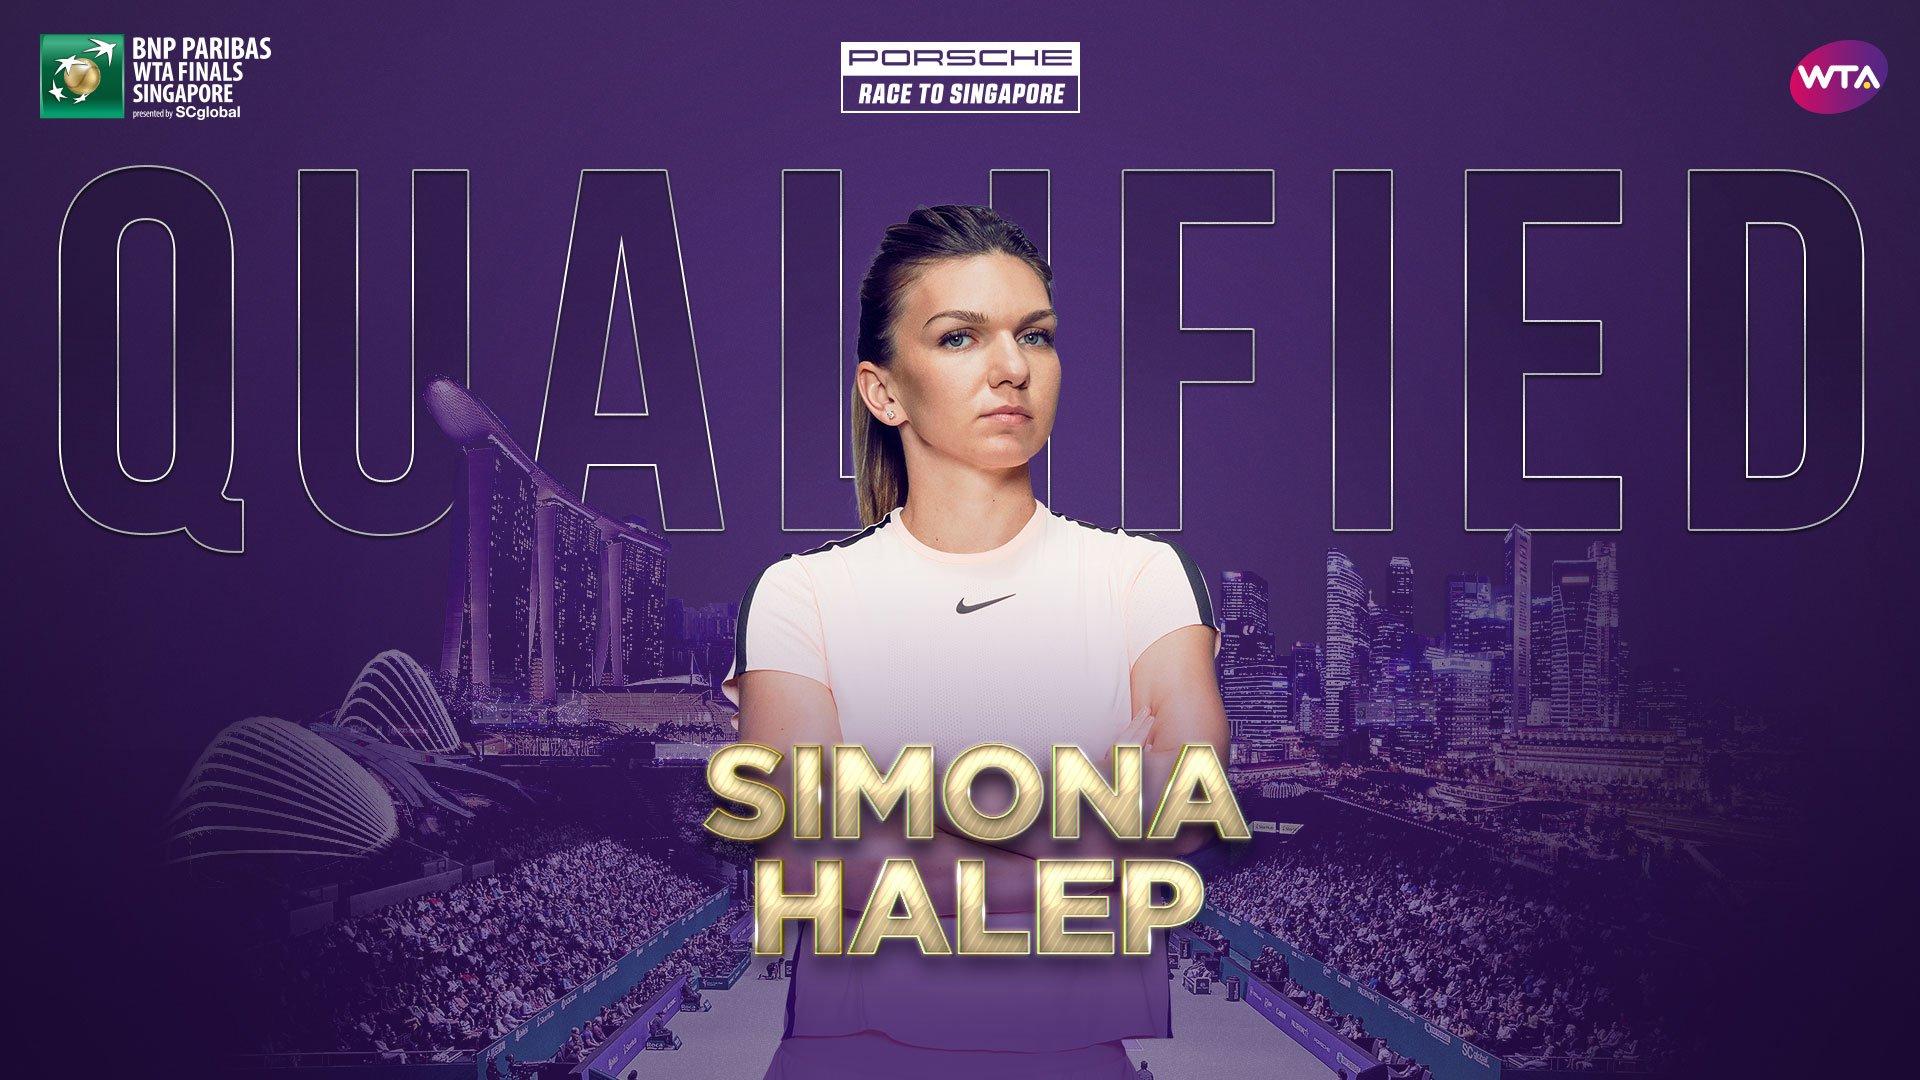 .@Simona_Halep is the first player to qualify for @WTAFinalsSG--> https://t.co/ewLuUkkVdD  @Porsche https://t.co/CidzDw6E62